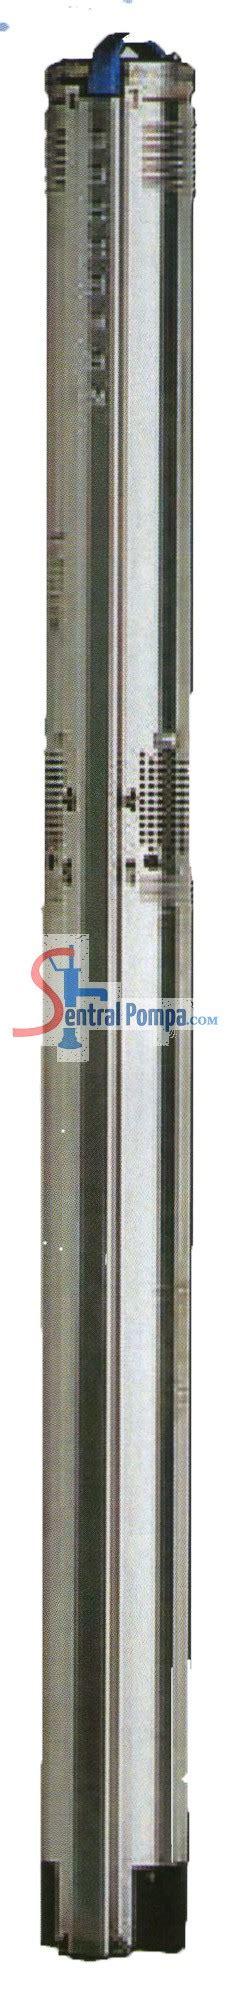 Pompa Submersible Merk Firman pompa submersible sumur 3 inch sentral pompa solusi